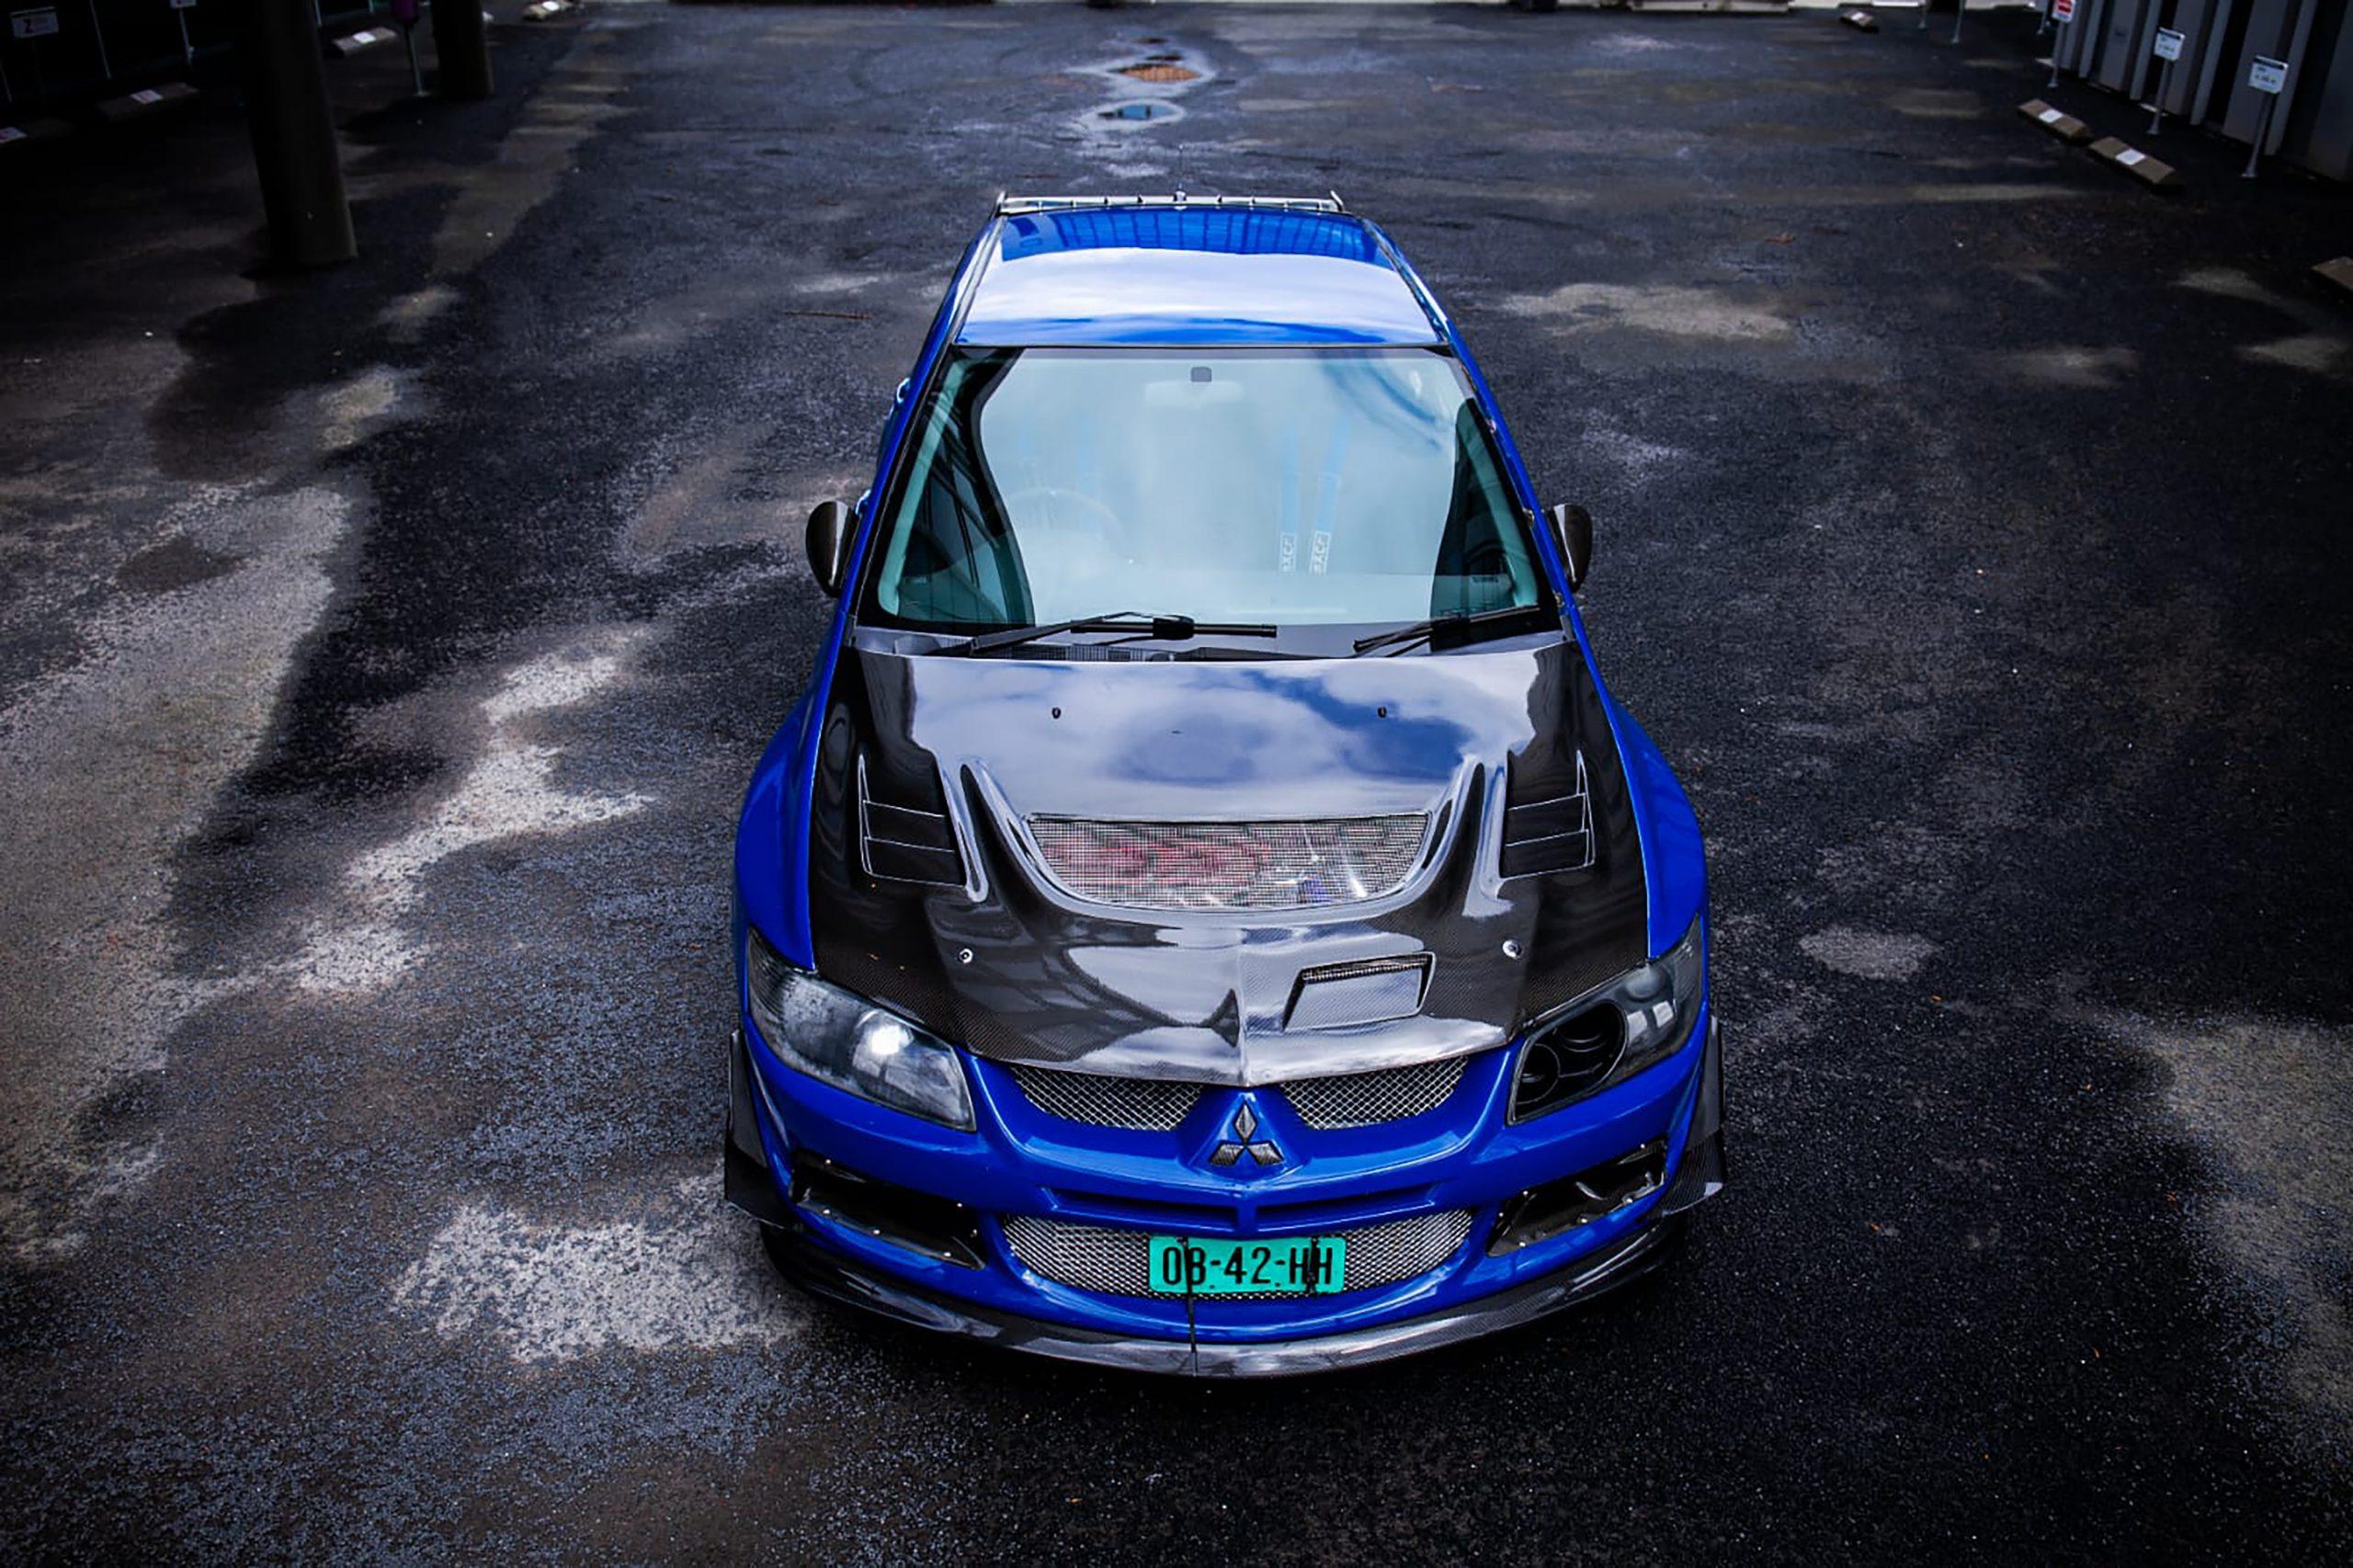 Mitsubishi-lancer-evo-8-front01-